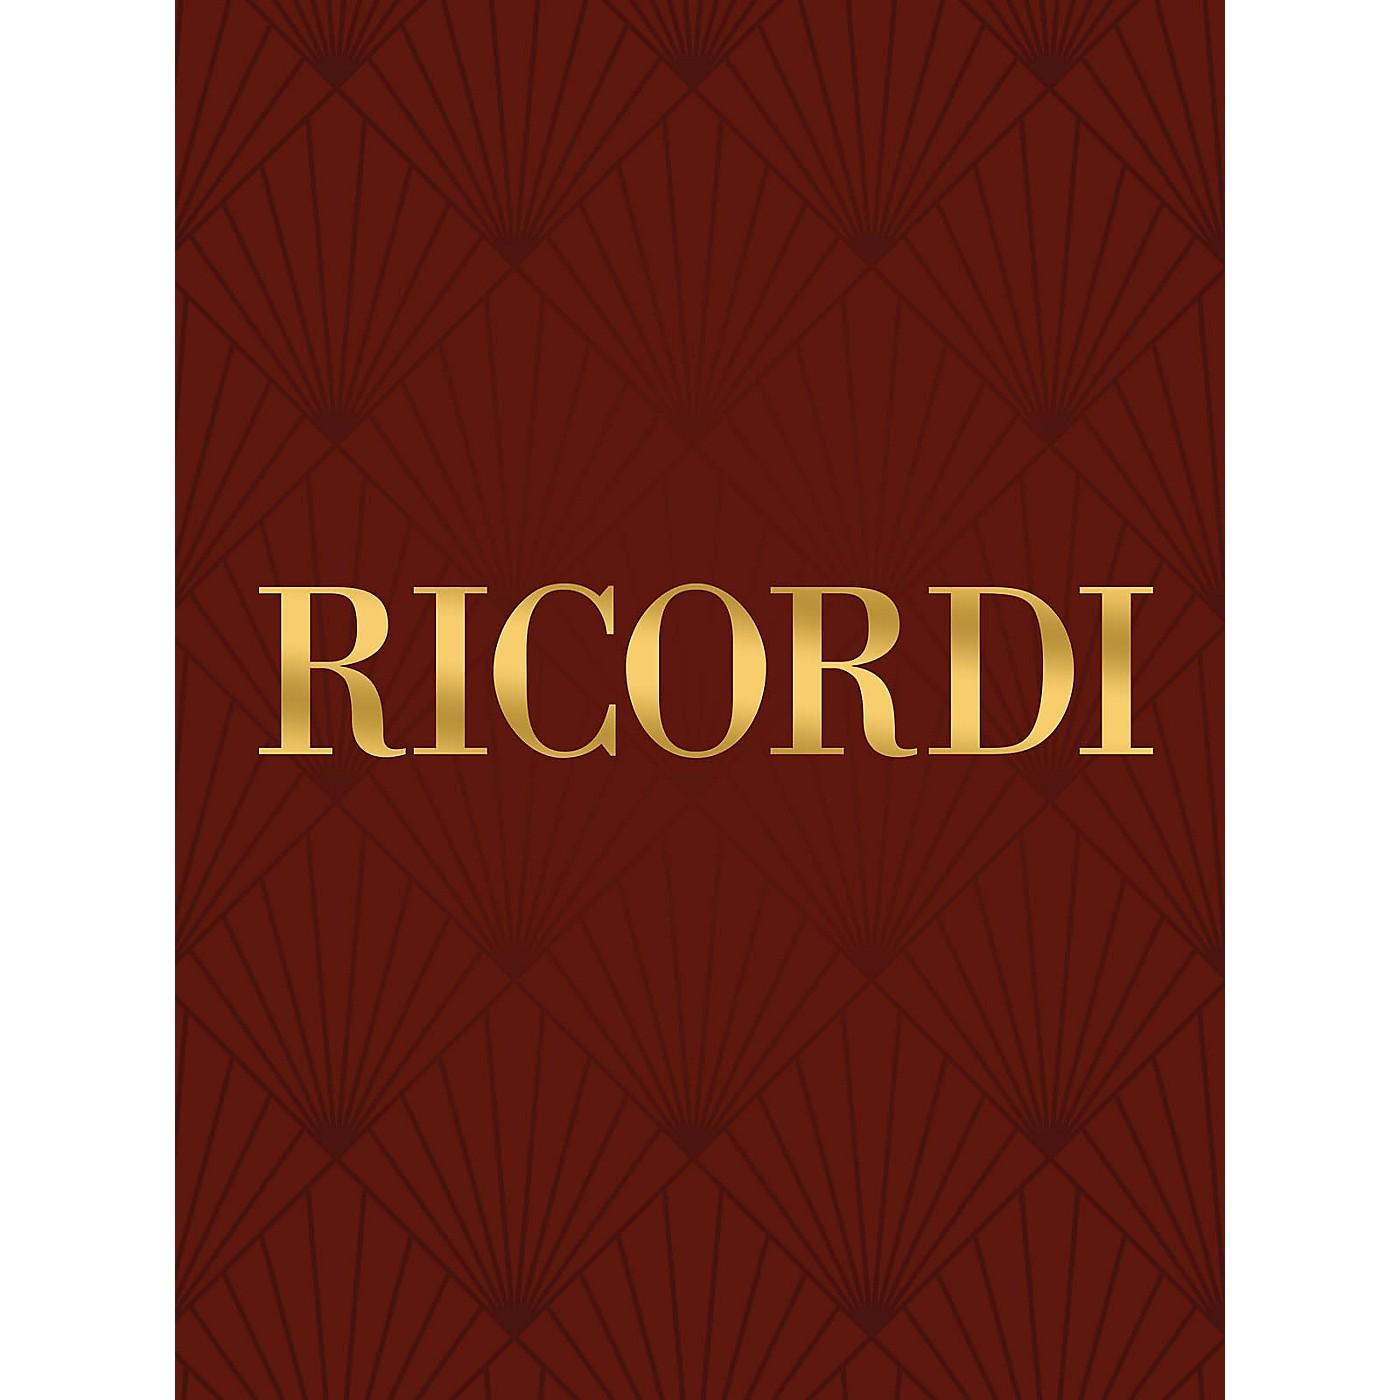 Ricordi 21 Capriccios for Unacc Clarinet Woodwind Solo  by G. B. Gambaro Edited by Alamiro Giampieri thumbnail